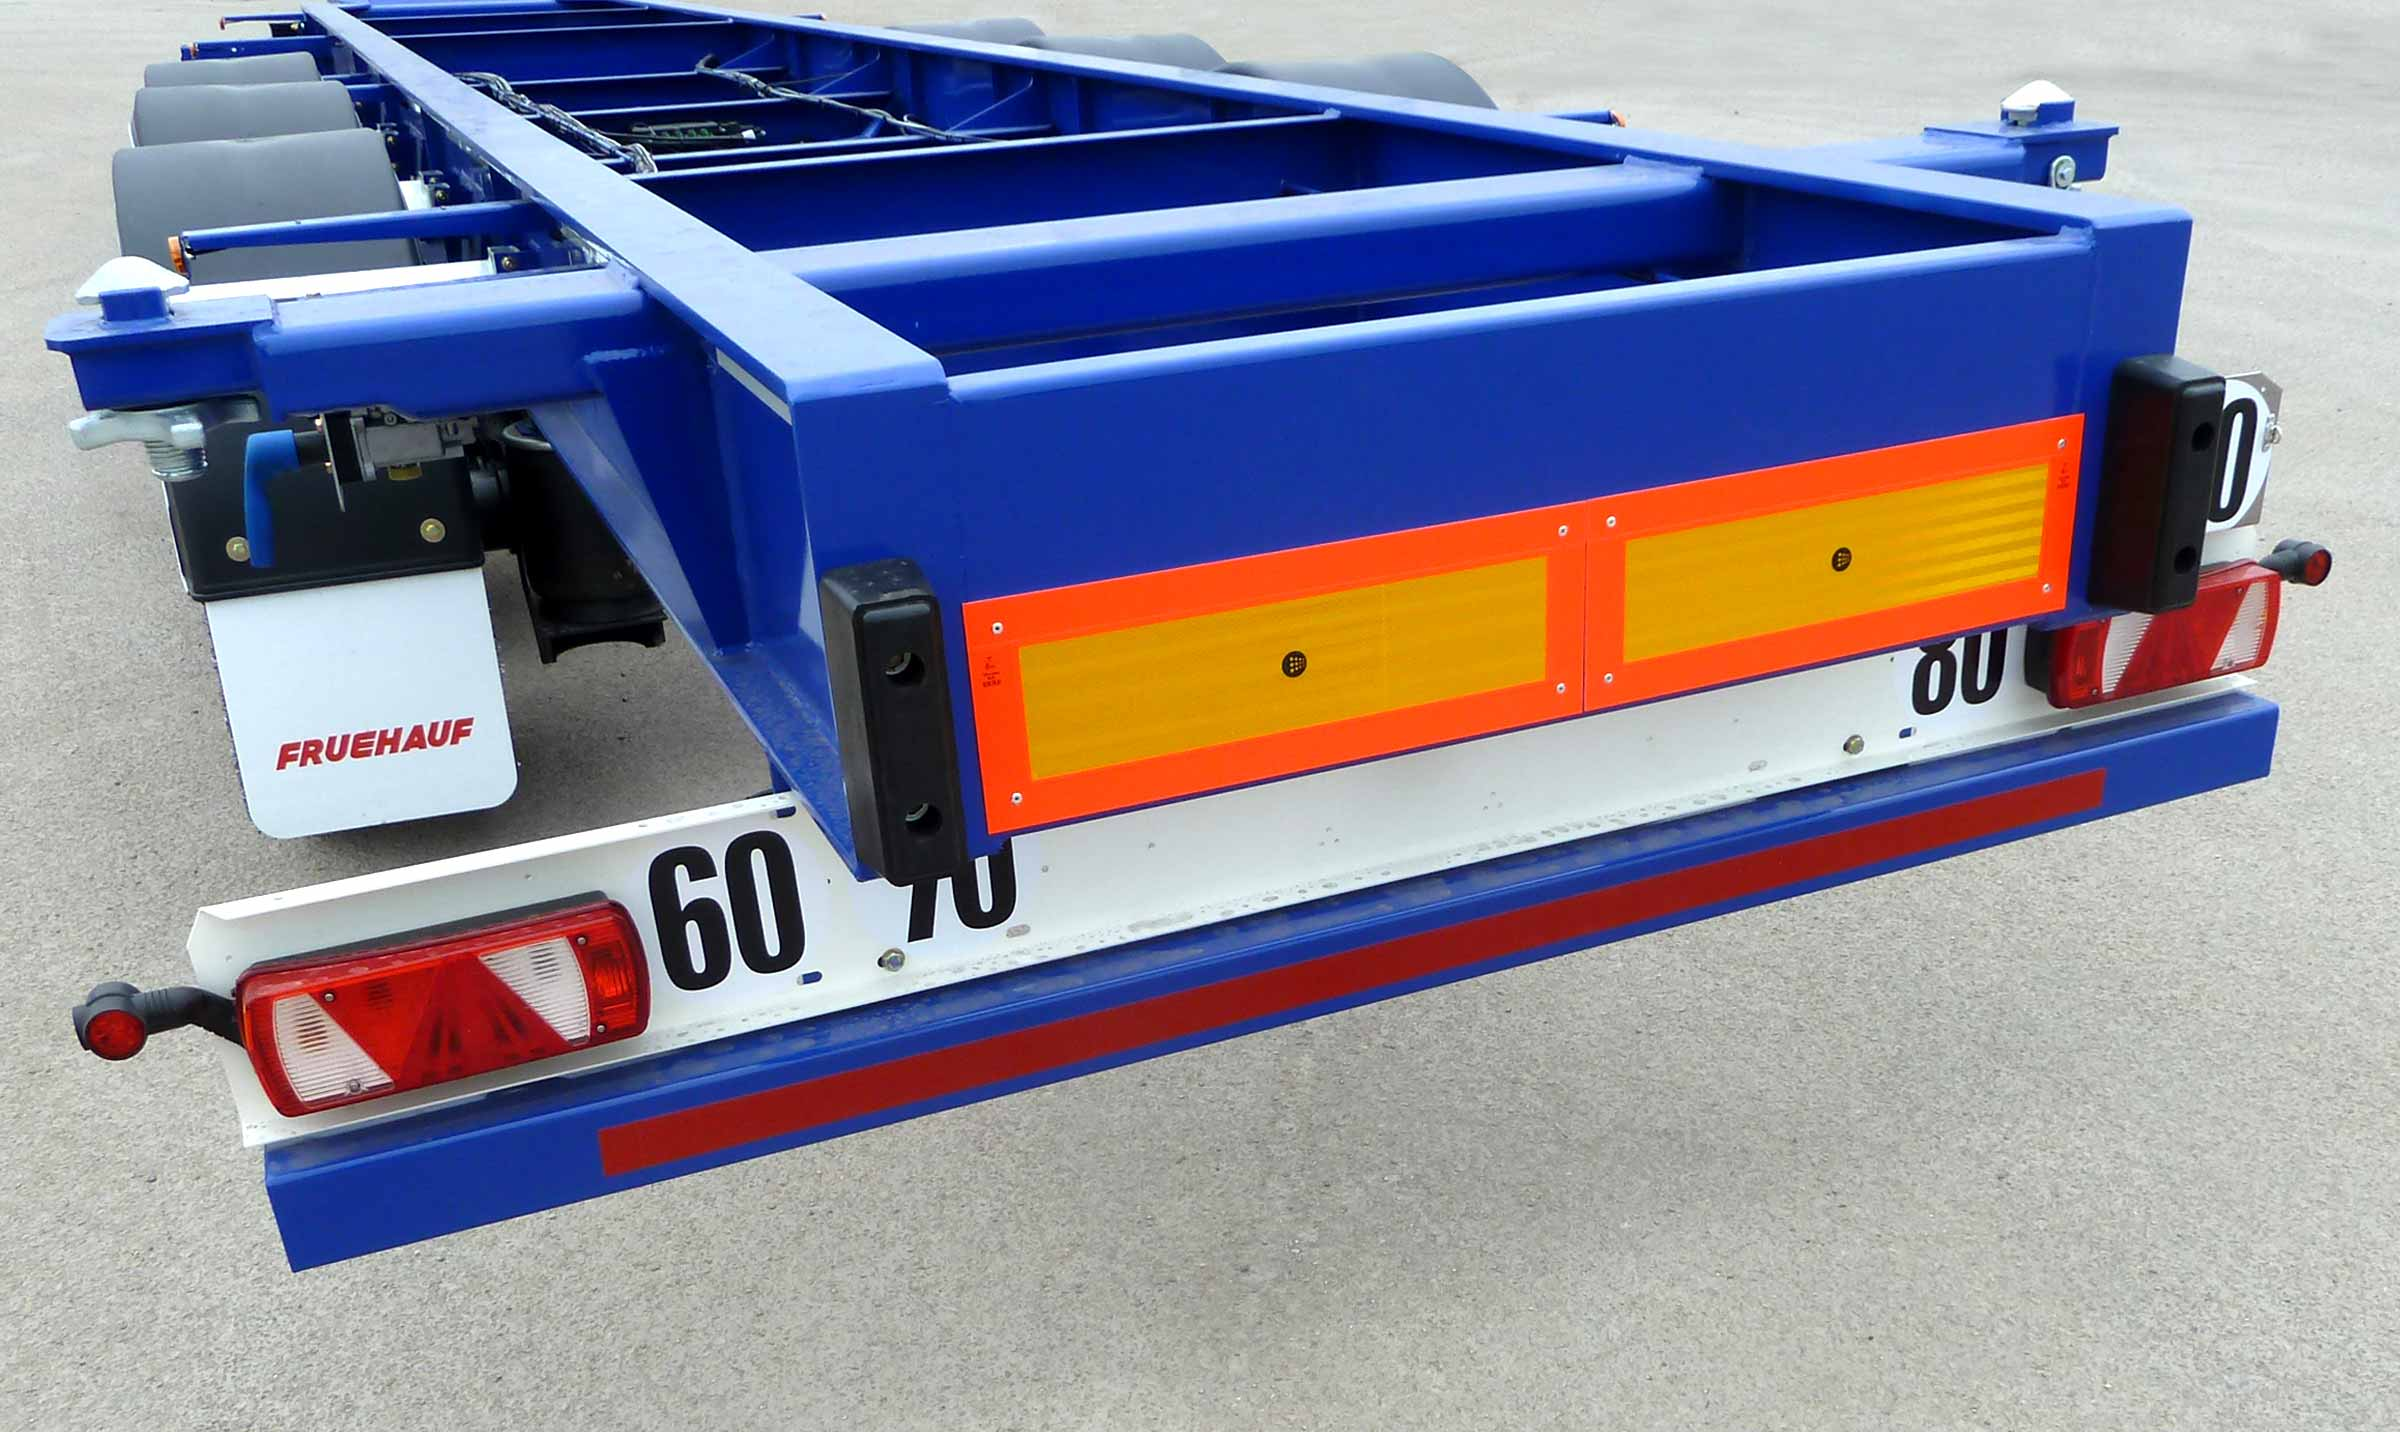 porte-conteneurs-CAMO-45-fruehauf